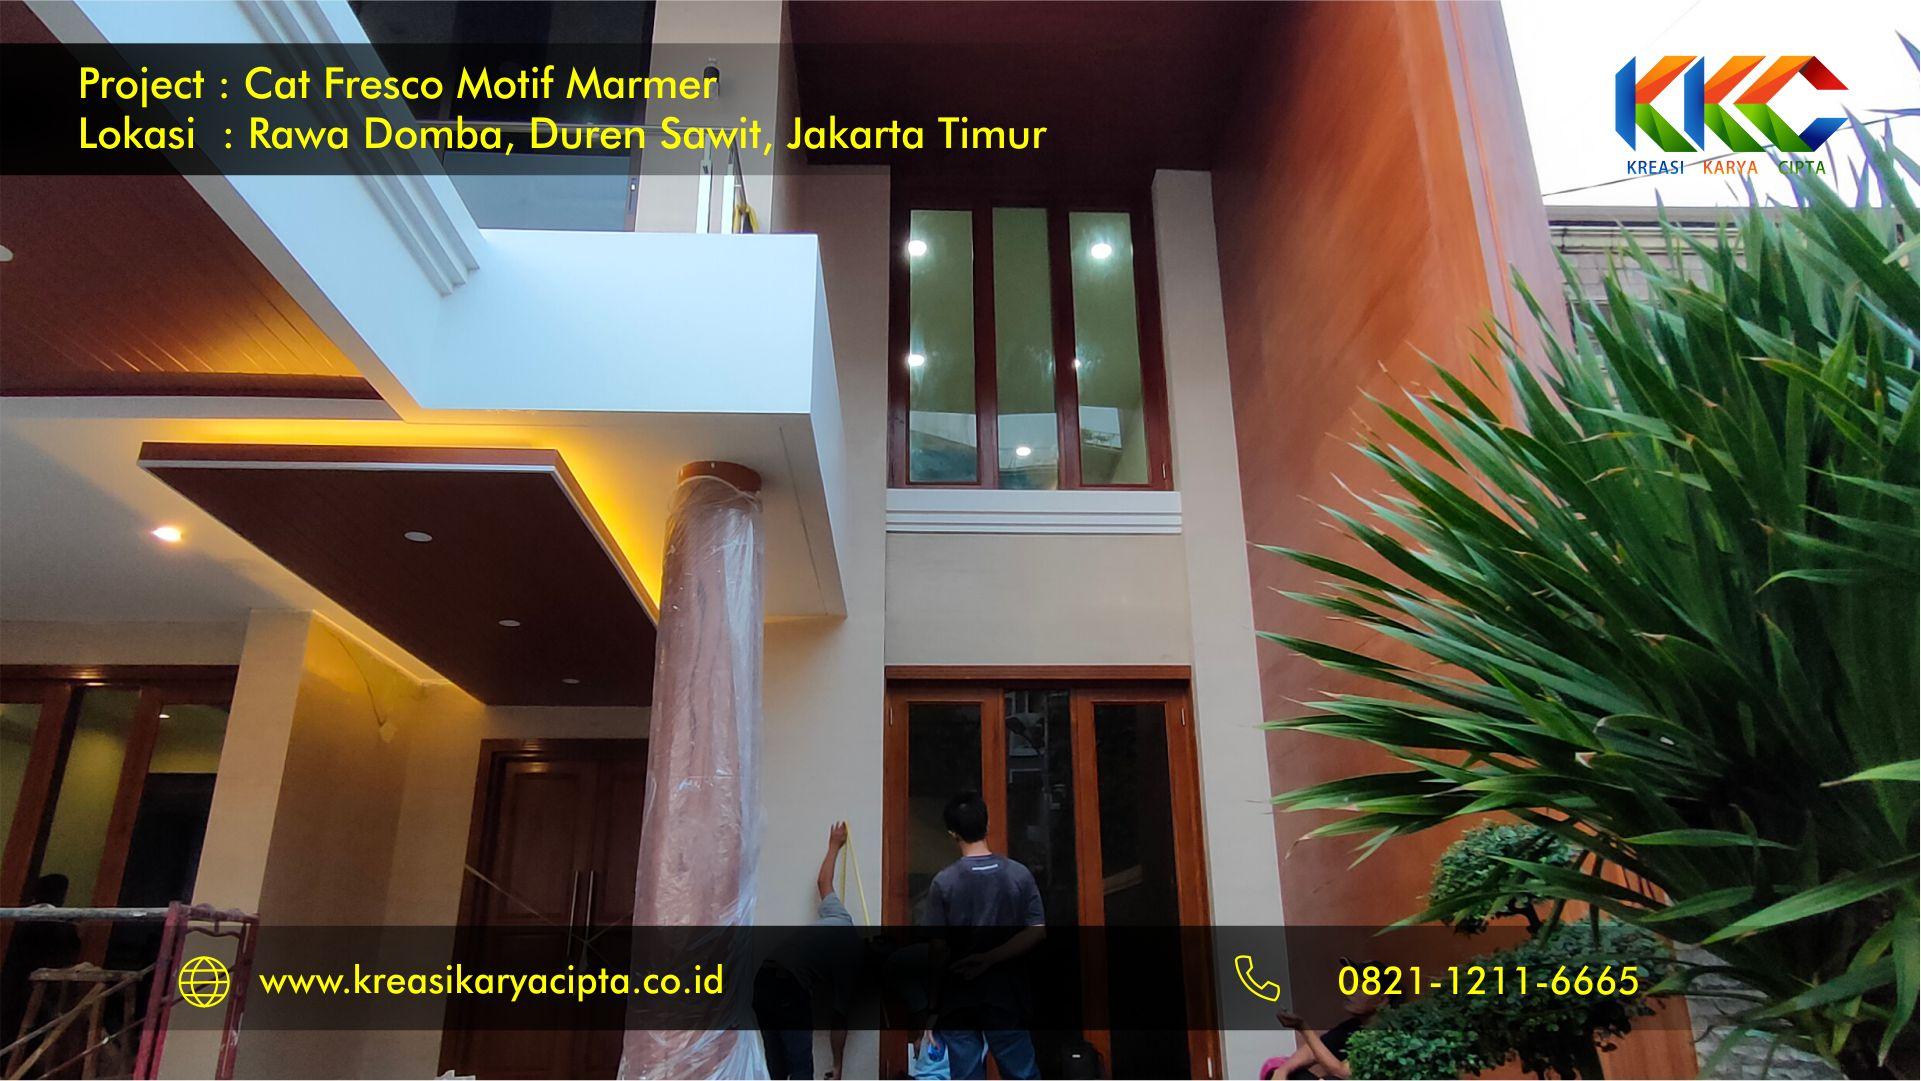 Project Pengecatan Fresco Motif Marmer Jakarta Timur | Jasa Pengecatan Dekoratif Motif Marmer Jakarta 2020